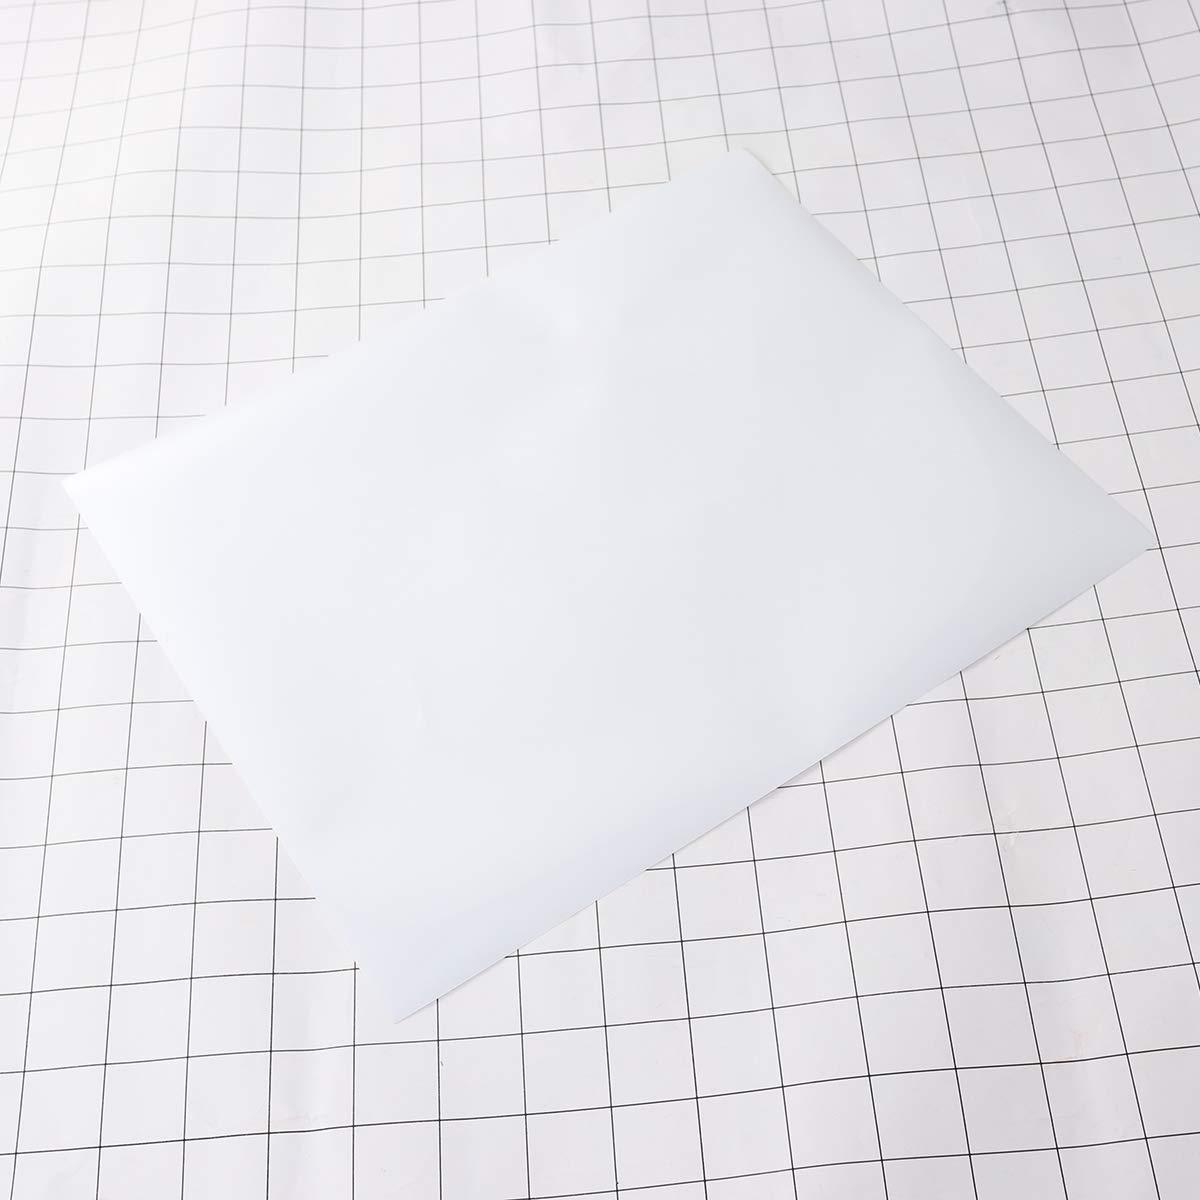 Vosarea Paquete de vinilo de transferencia de calor PU 25x30.5cm Hoja de colores surtidos Camiseta de bricolaje Hojas de transferencia de vinilo - Mejor hierro en vinilo HTV para Silhouette Cameo, Cricut -